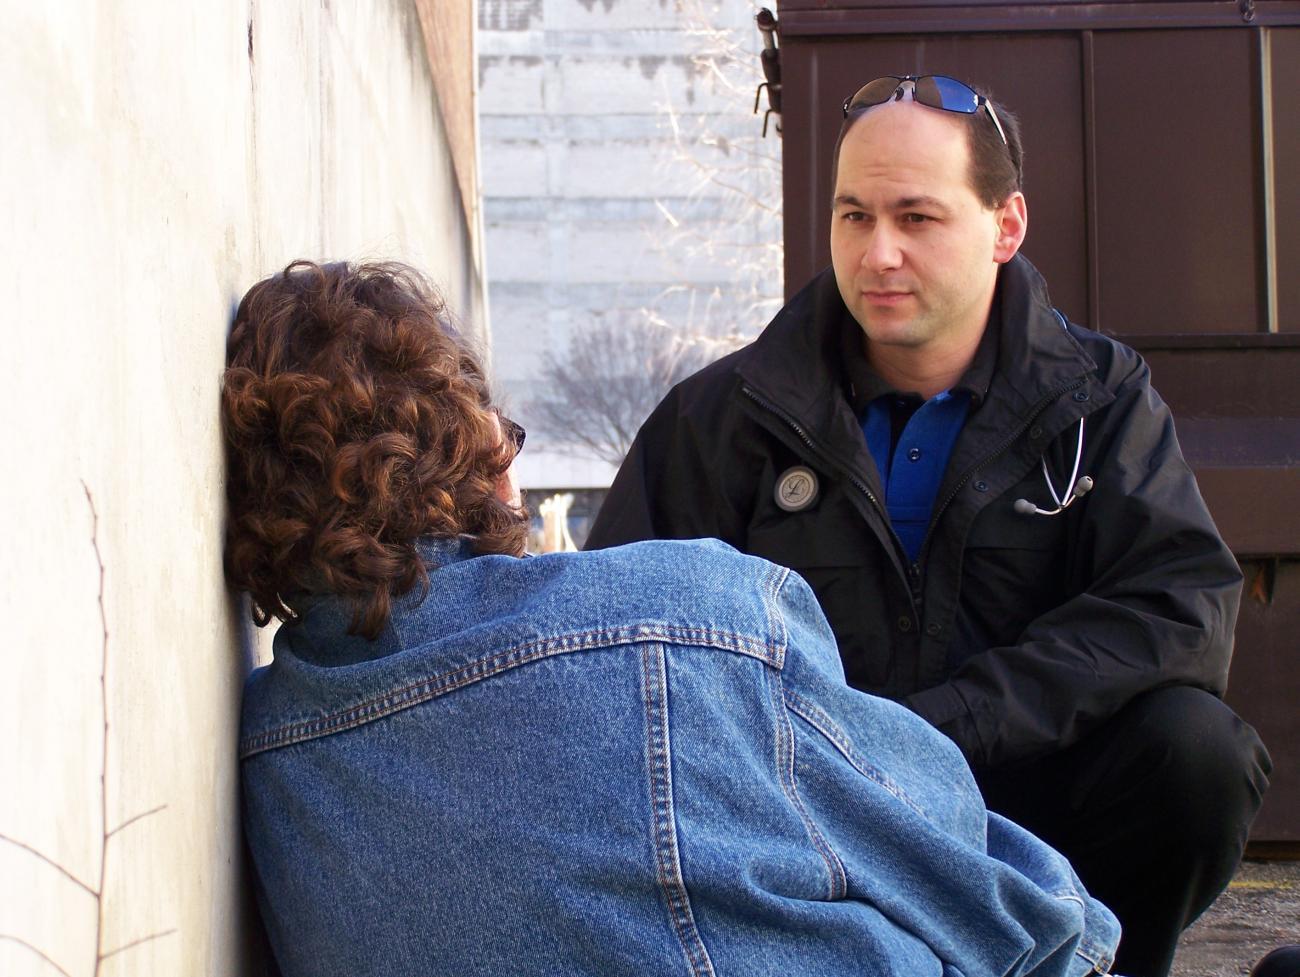 Paramedic comforts a community member in distress